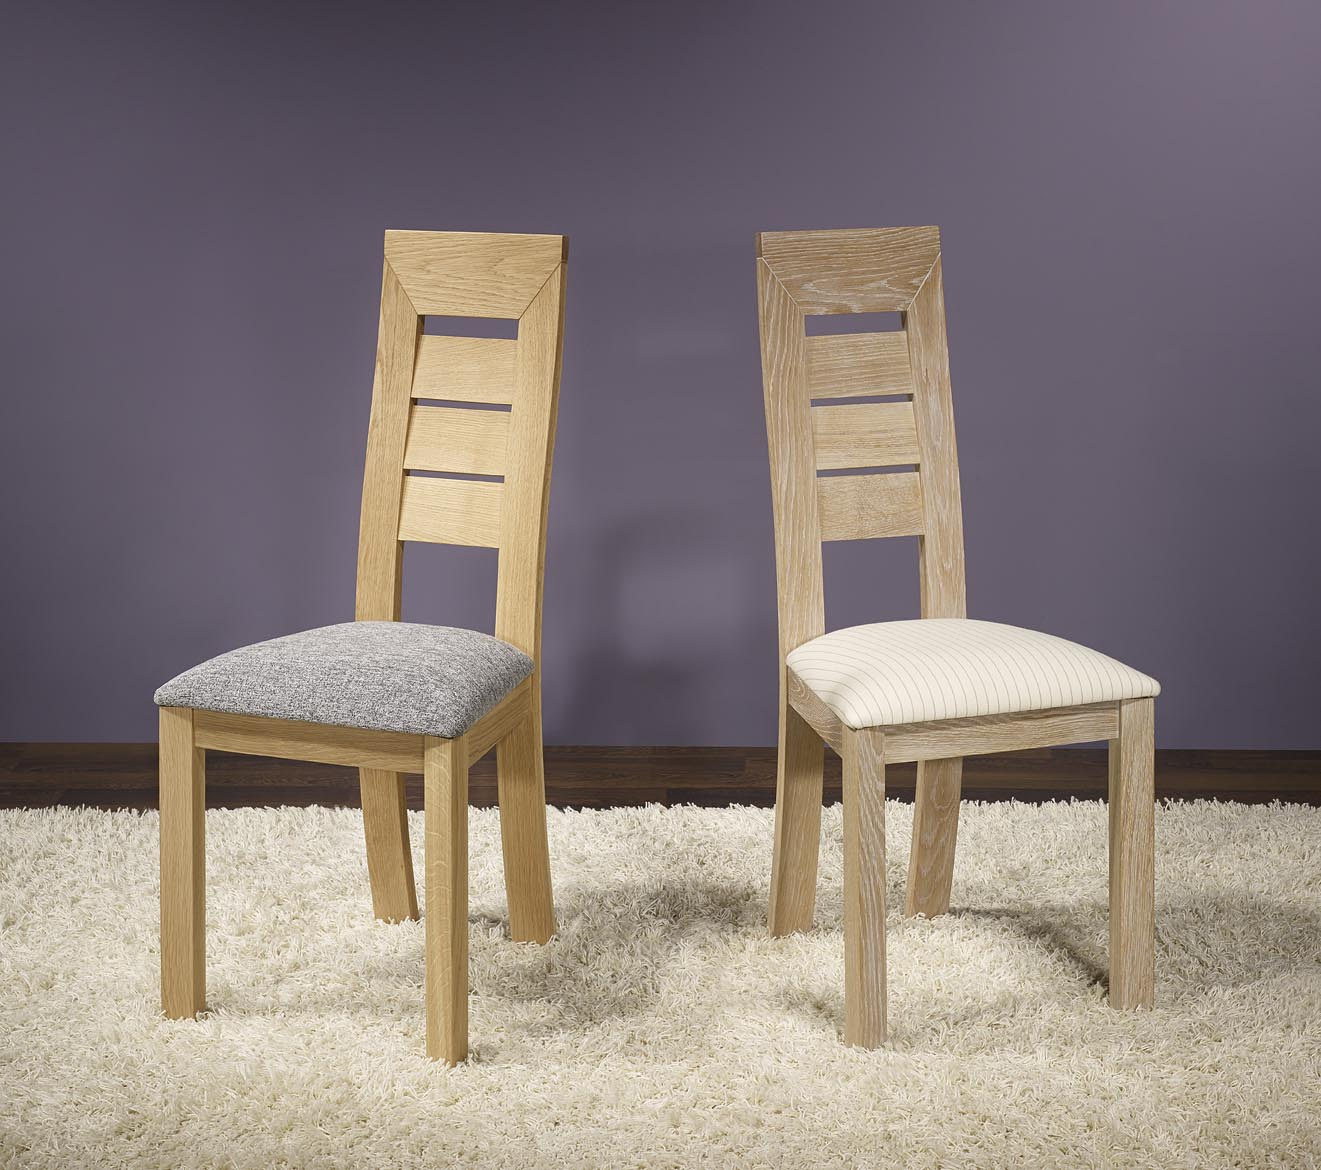 meuble en chene chaise mathis realise en chene massif ligne contemporaine